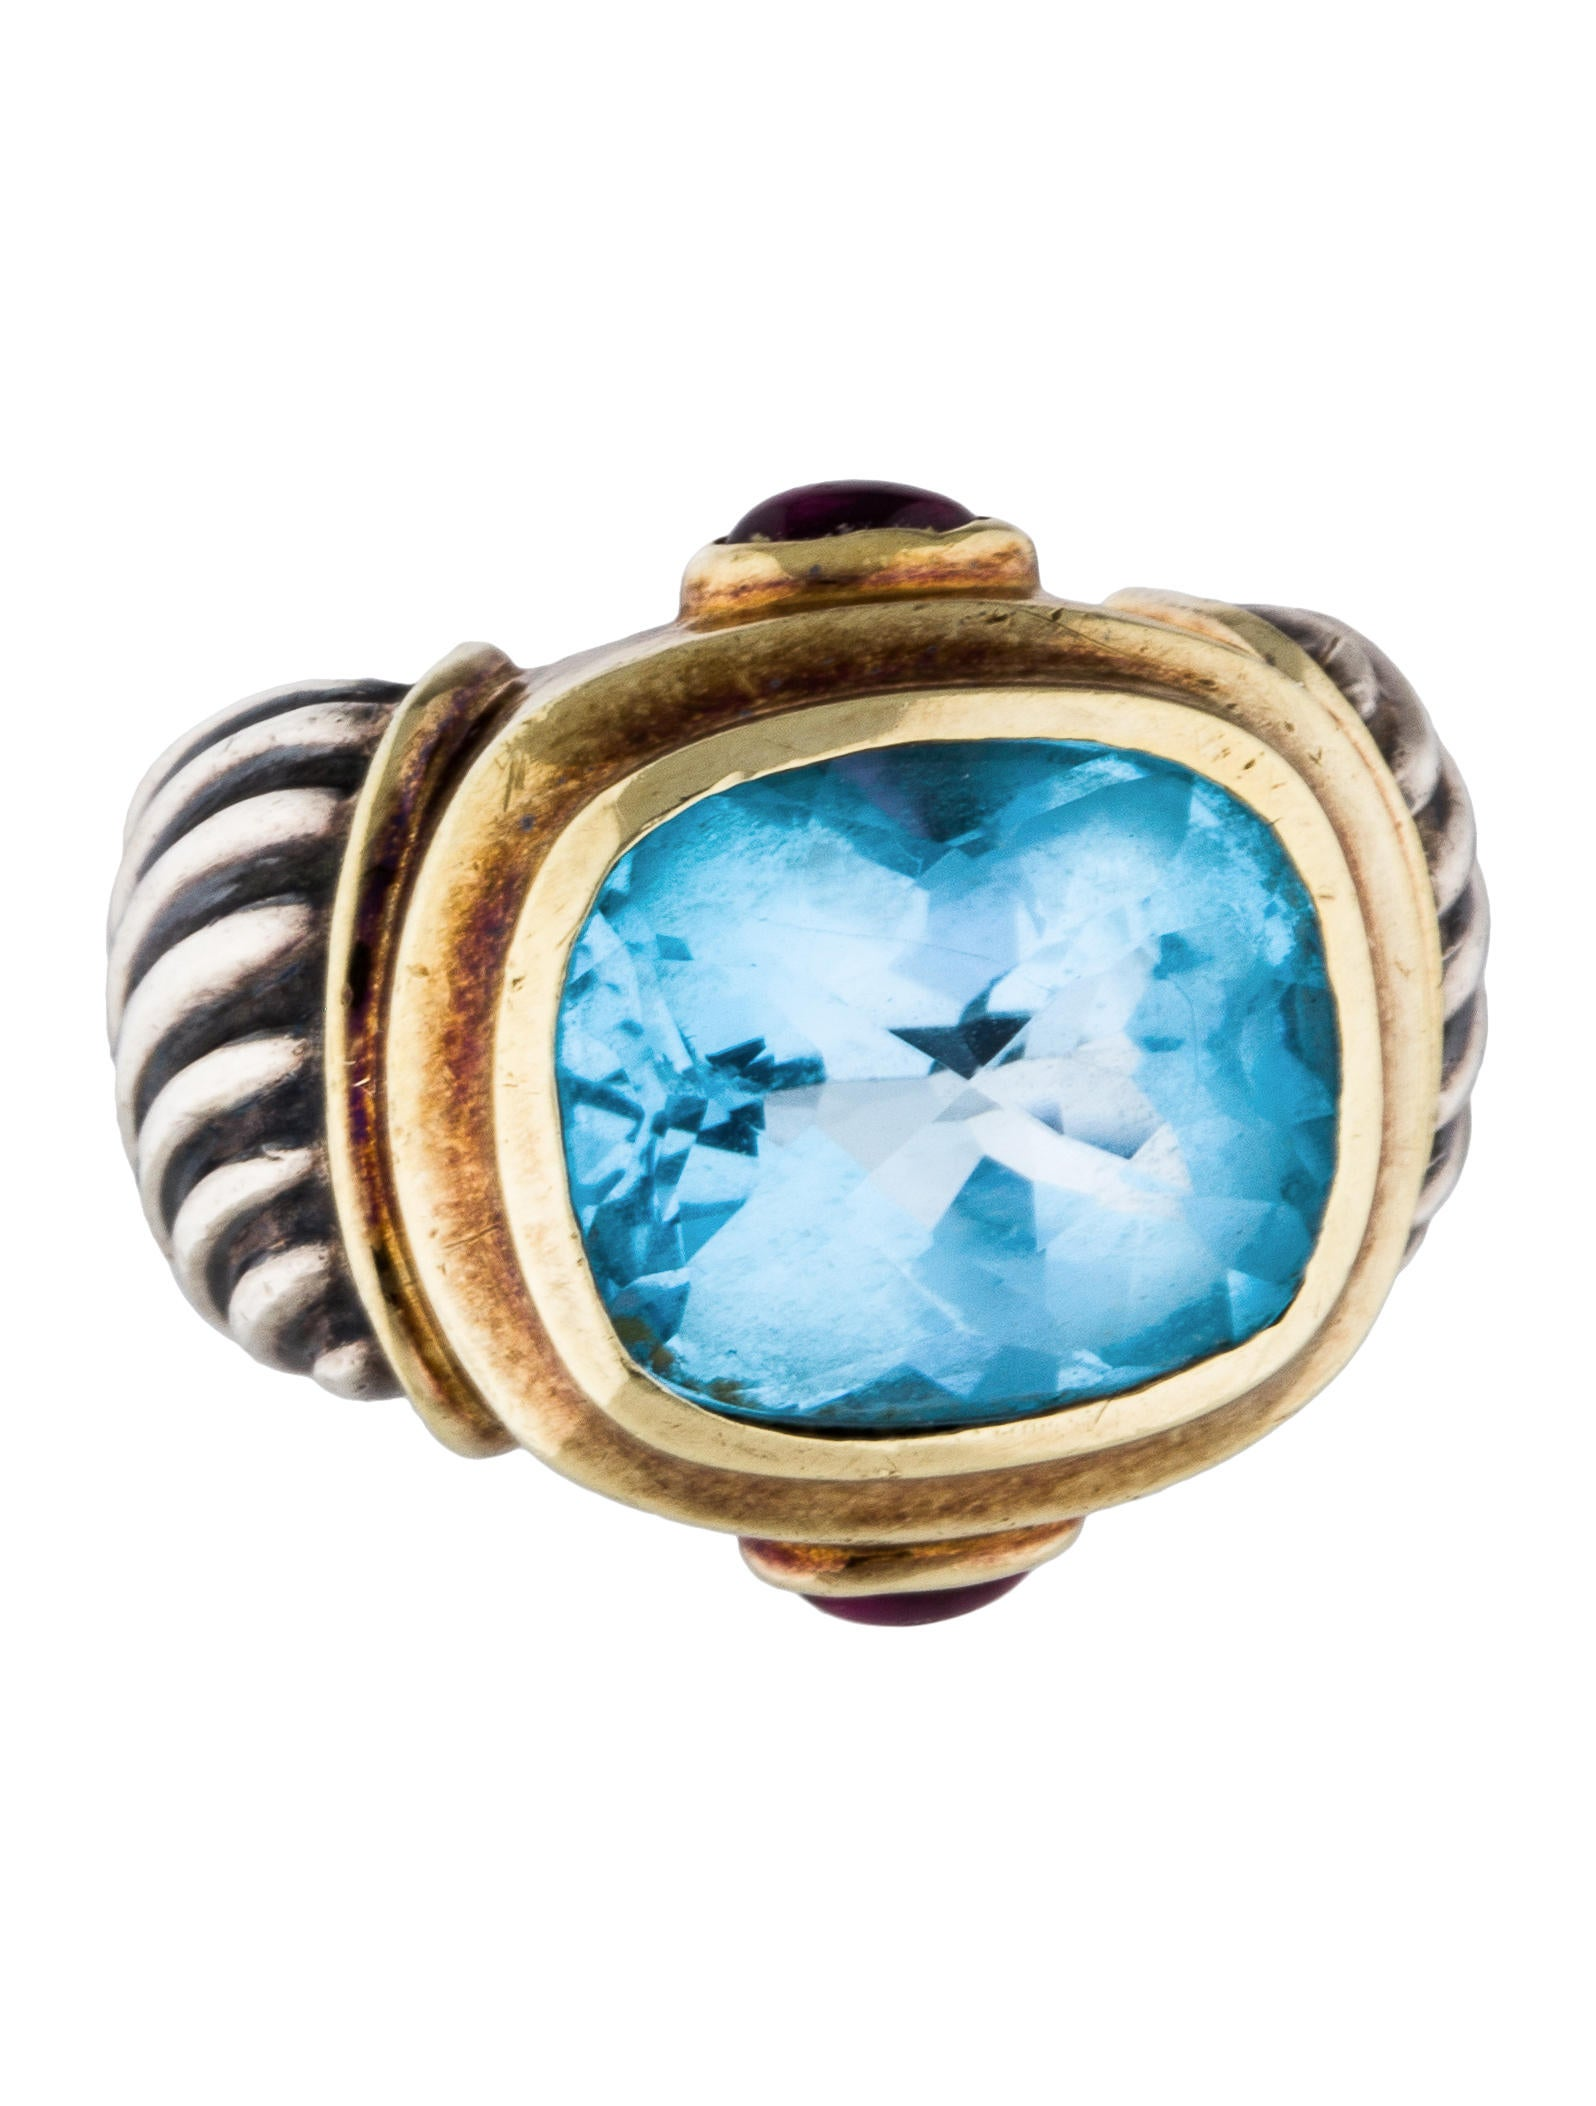 David yurman rhodolite topaz two tone ring rings for David yurman inspired jewelry rings